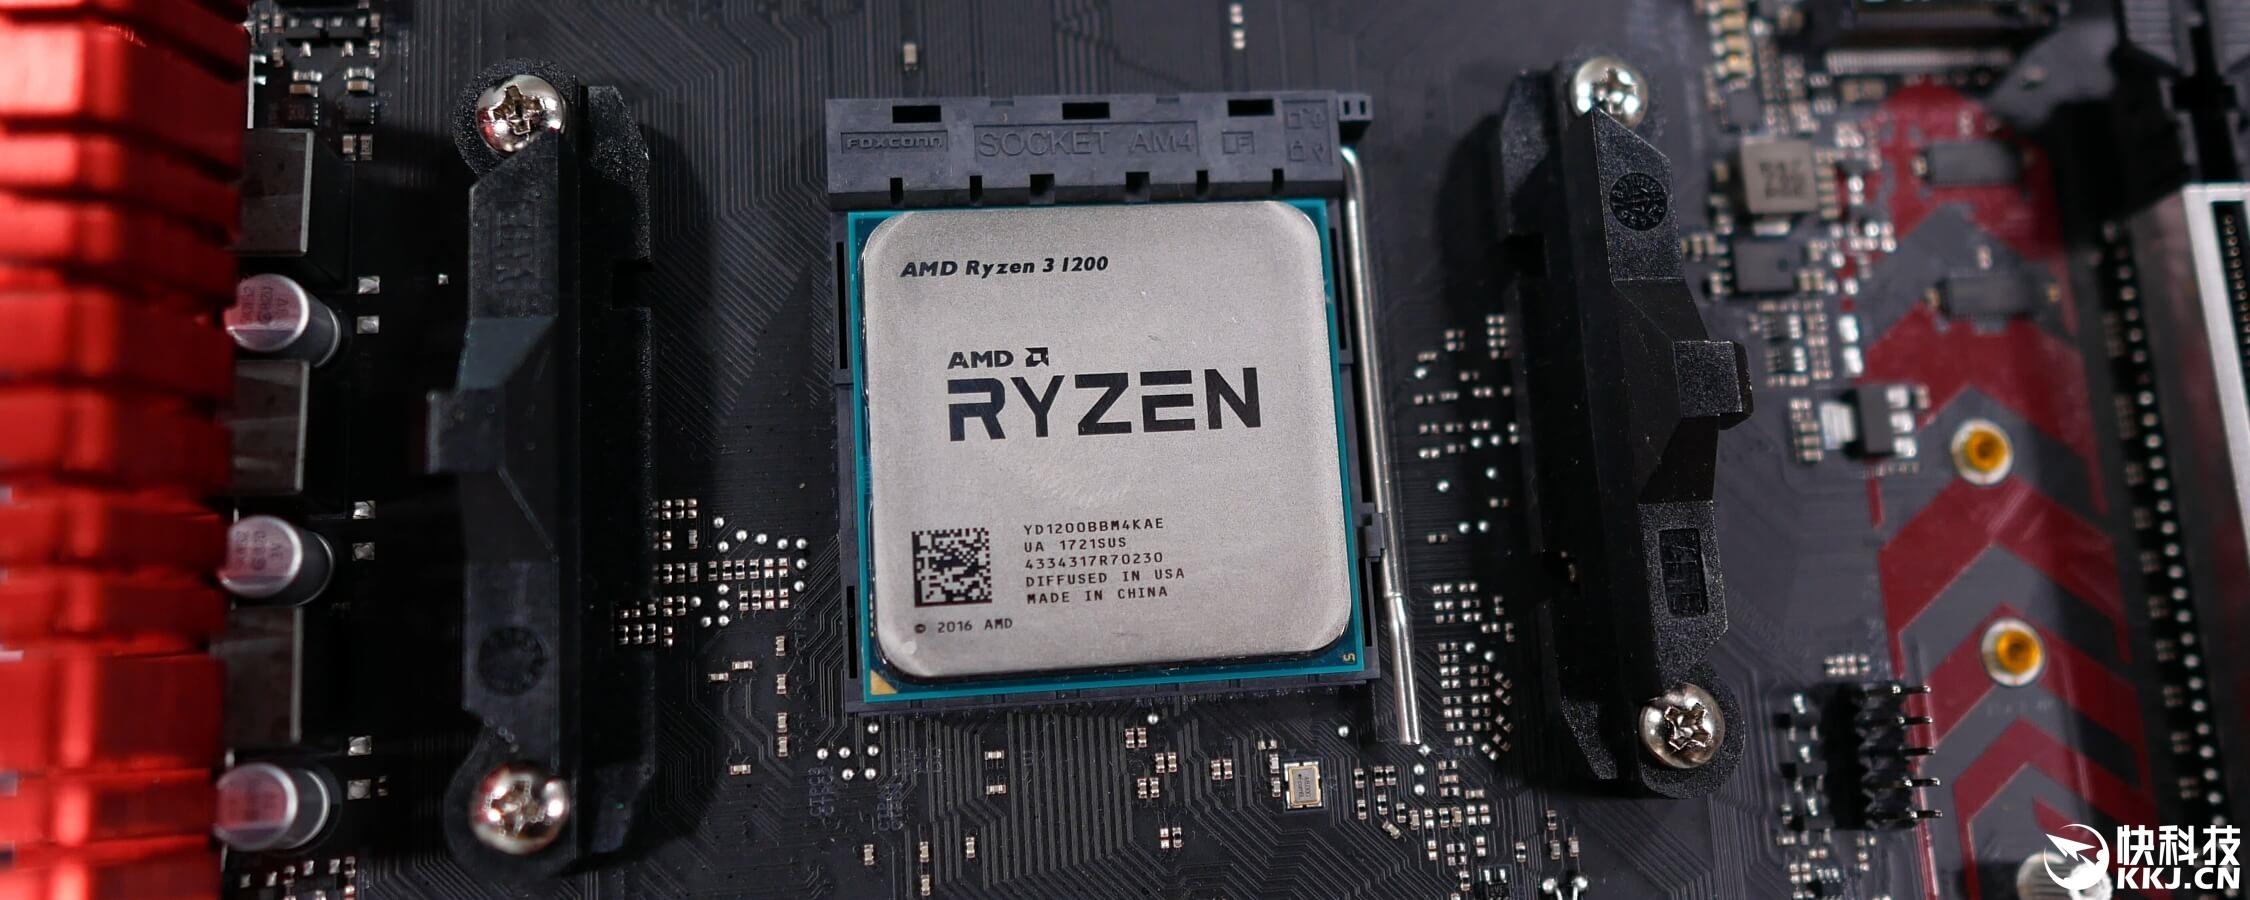 AMDRyzen3对比i5-2500K 明星级老产品果然厉害